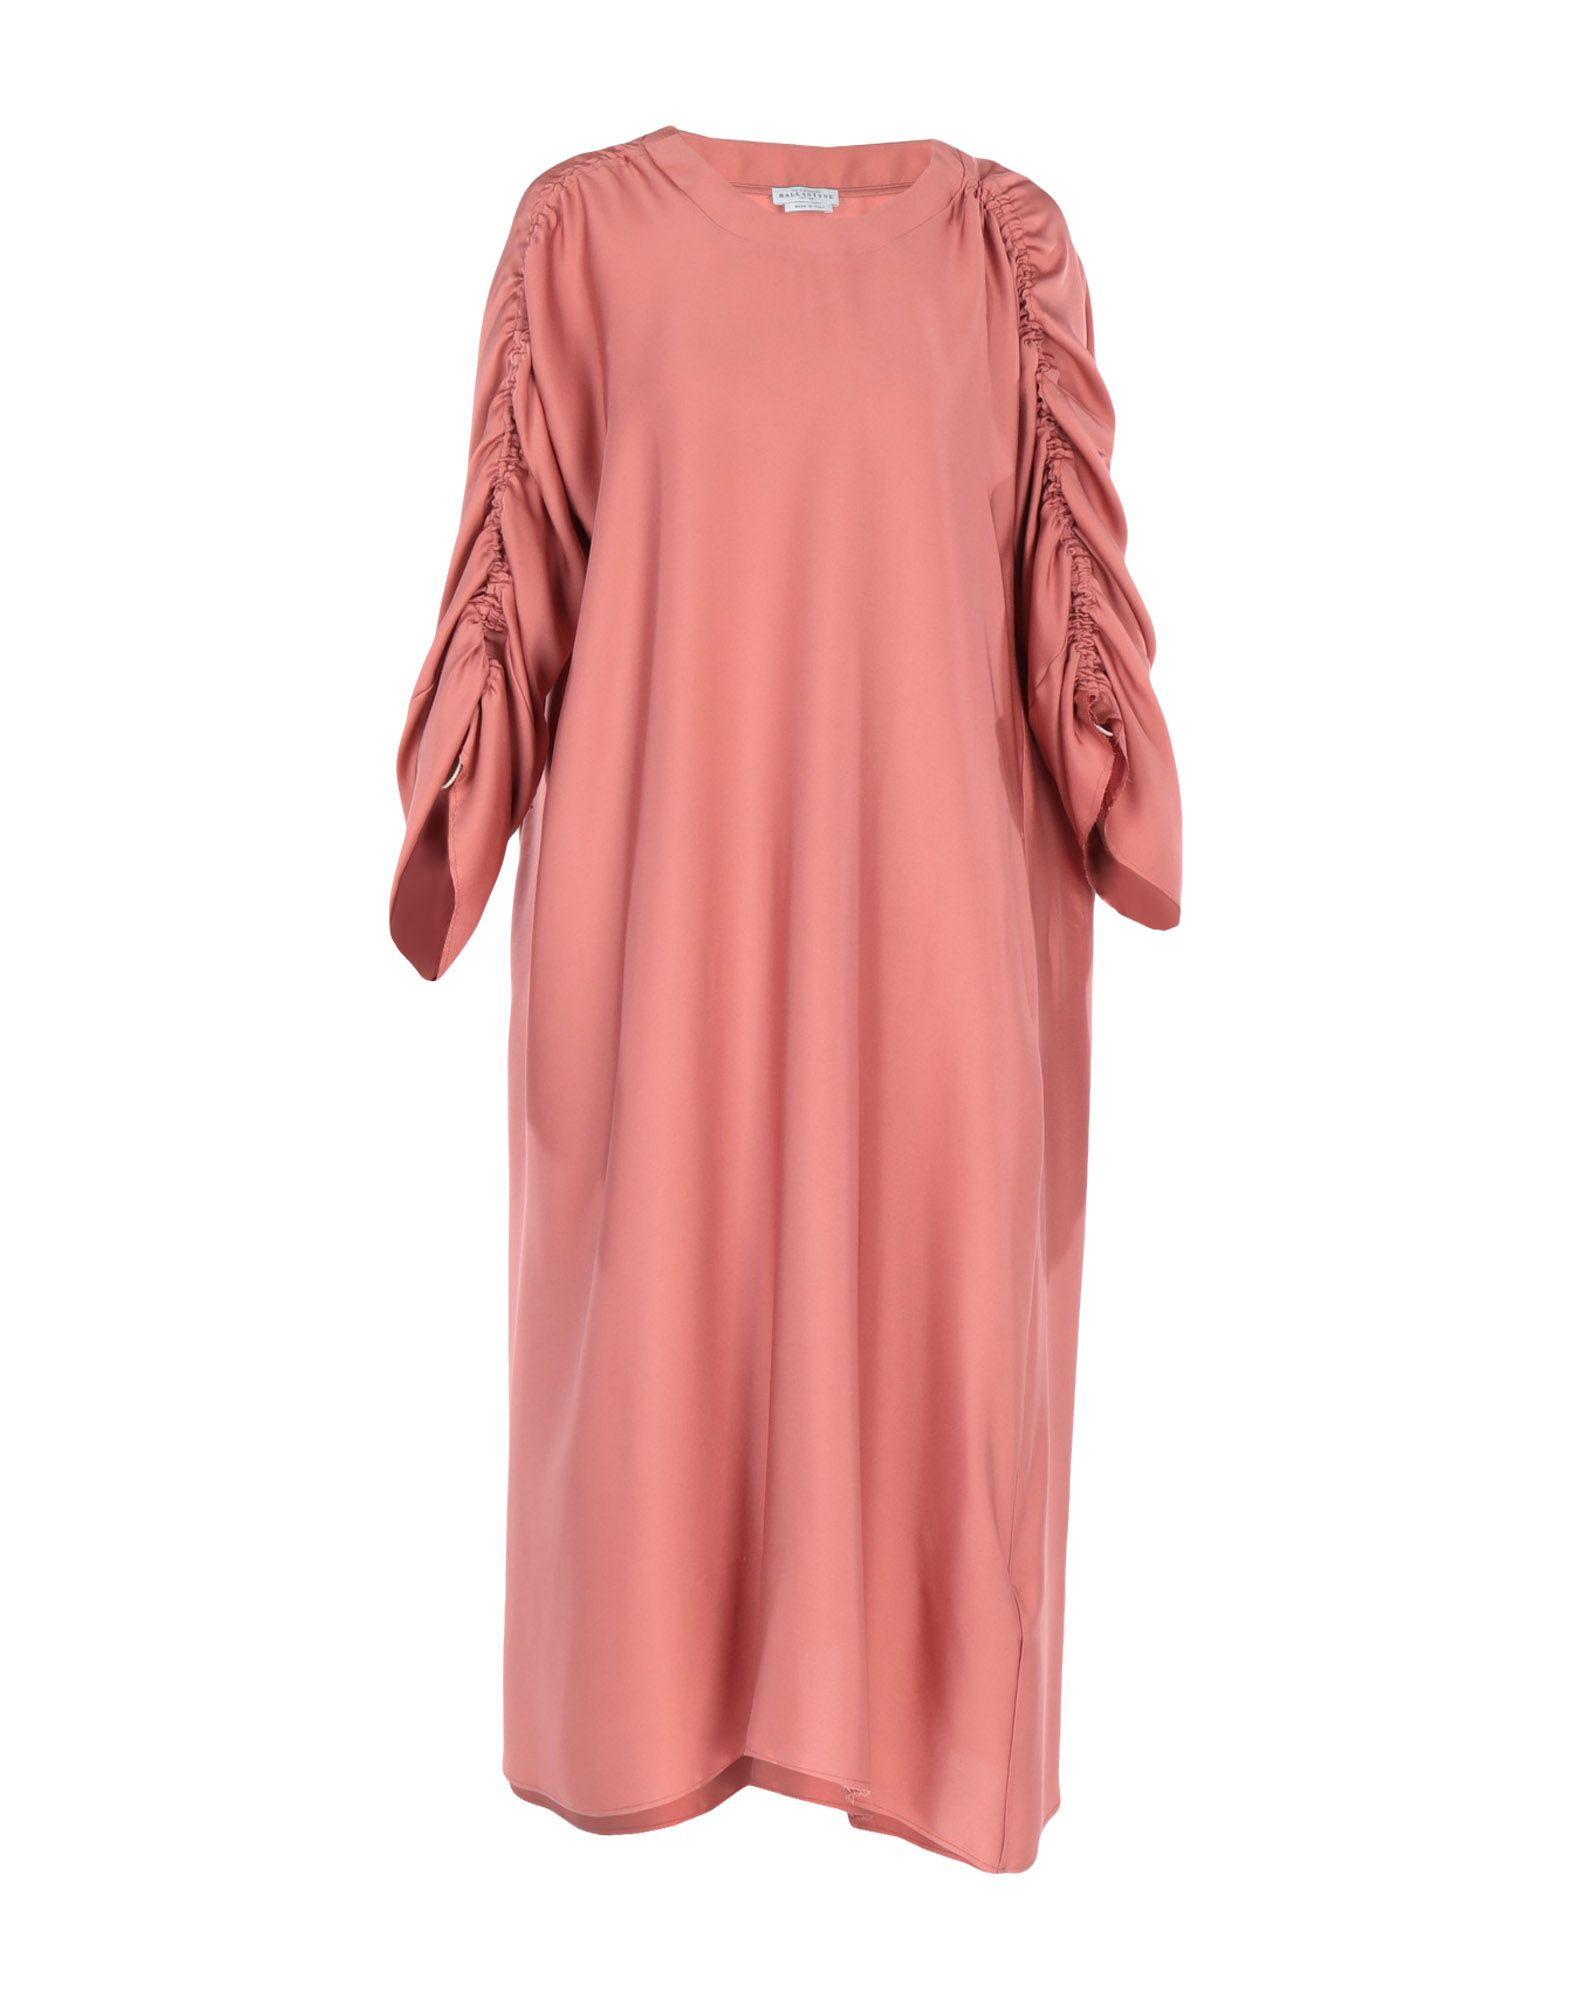 BALLANTYNE Платье длиной 3/4 boss black платье длиной 3 4